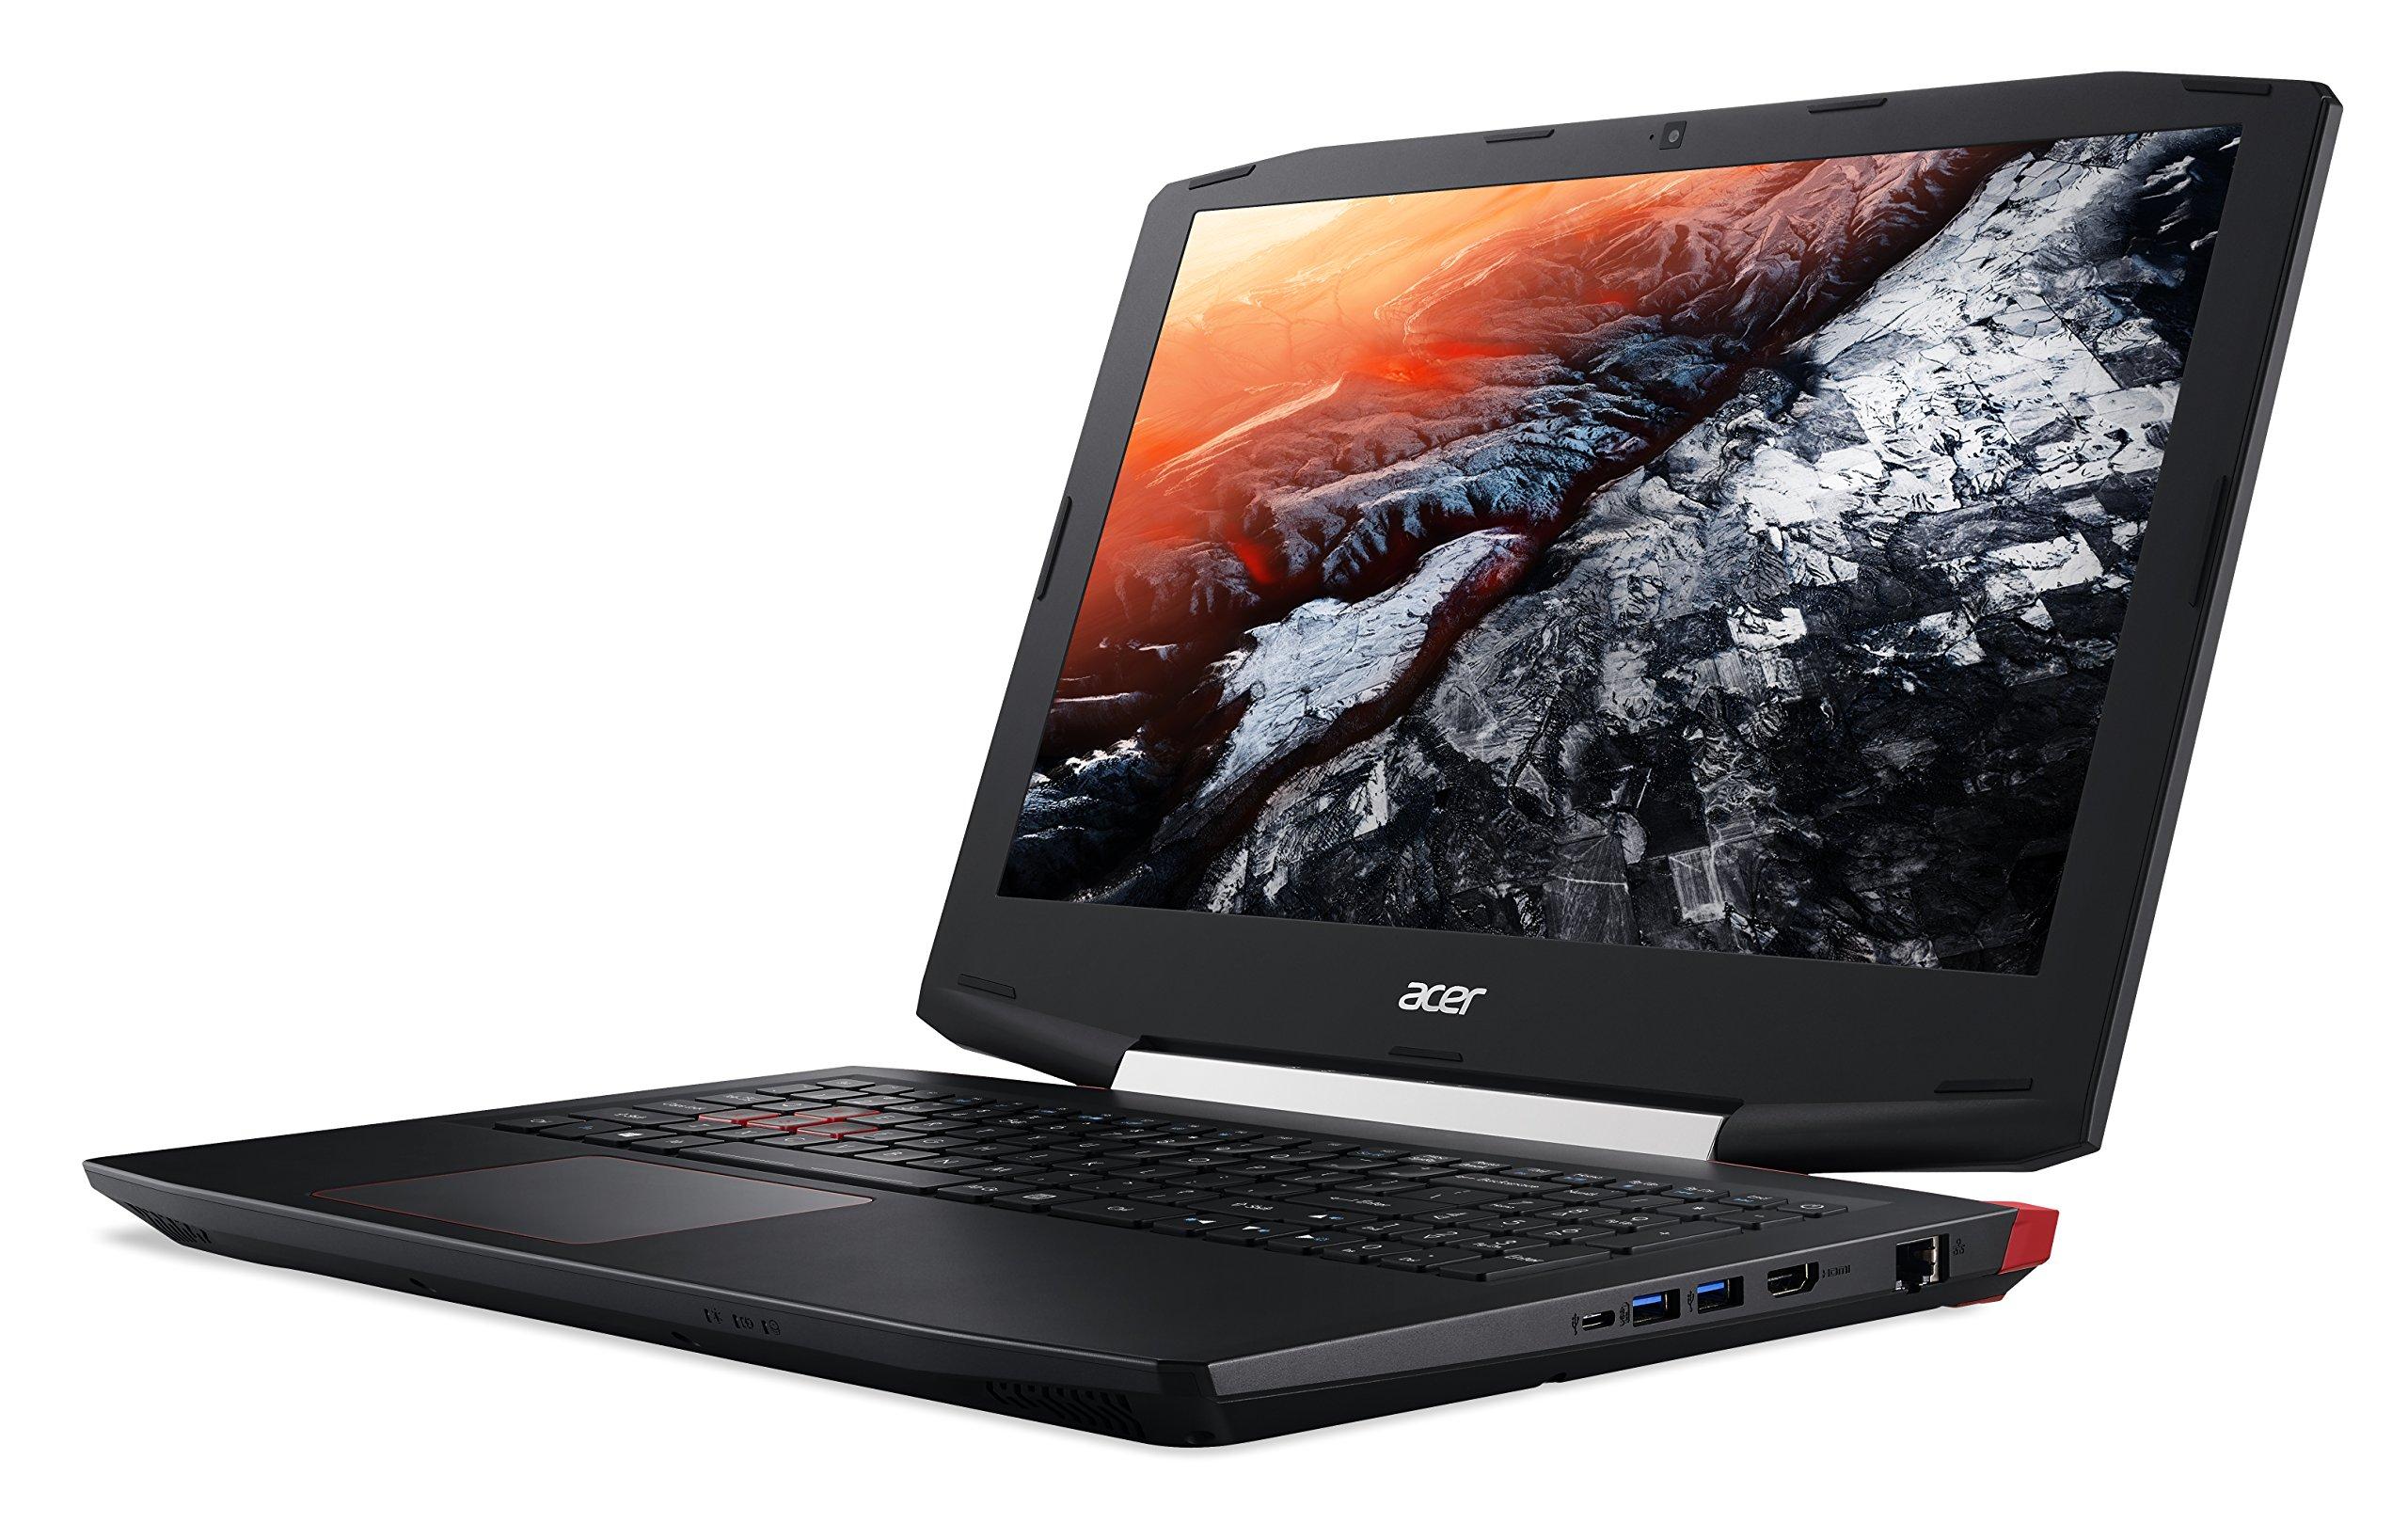 Acer Aspire VX 15 Gaming Laptop, 7th Gen Intel Core i7, NVIDIA GeForce GTX 1050 Ti, 15.6 Full HD, 16GB DDR4, 256GB SSD, VX5-591G-75RM by Acer (Image #2)